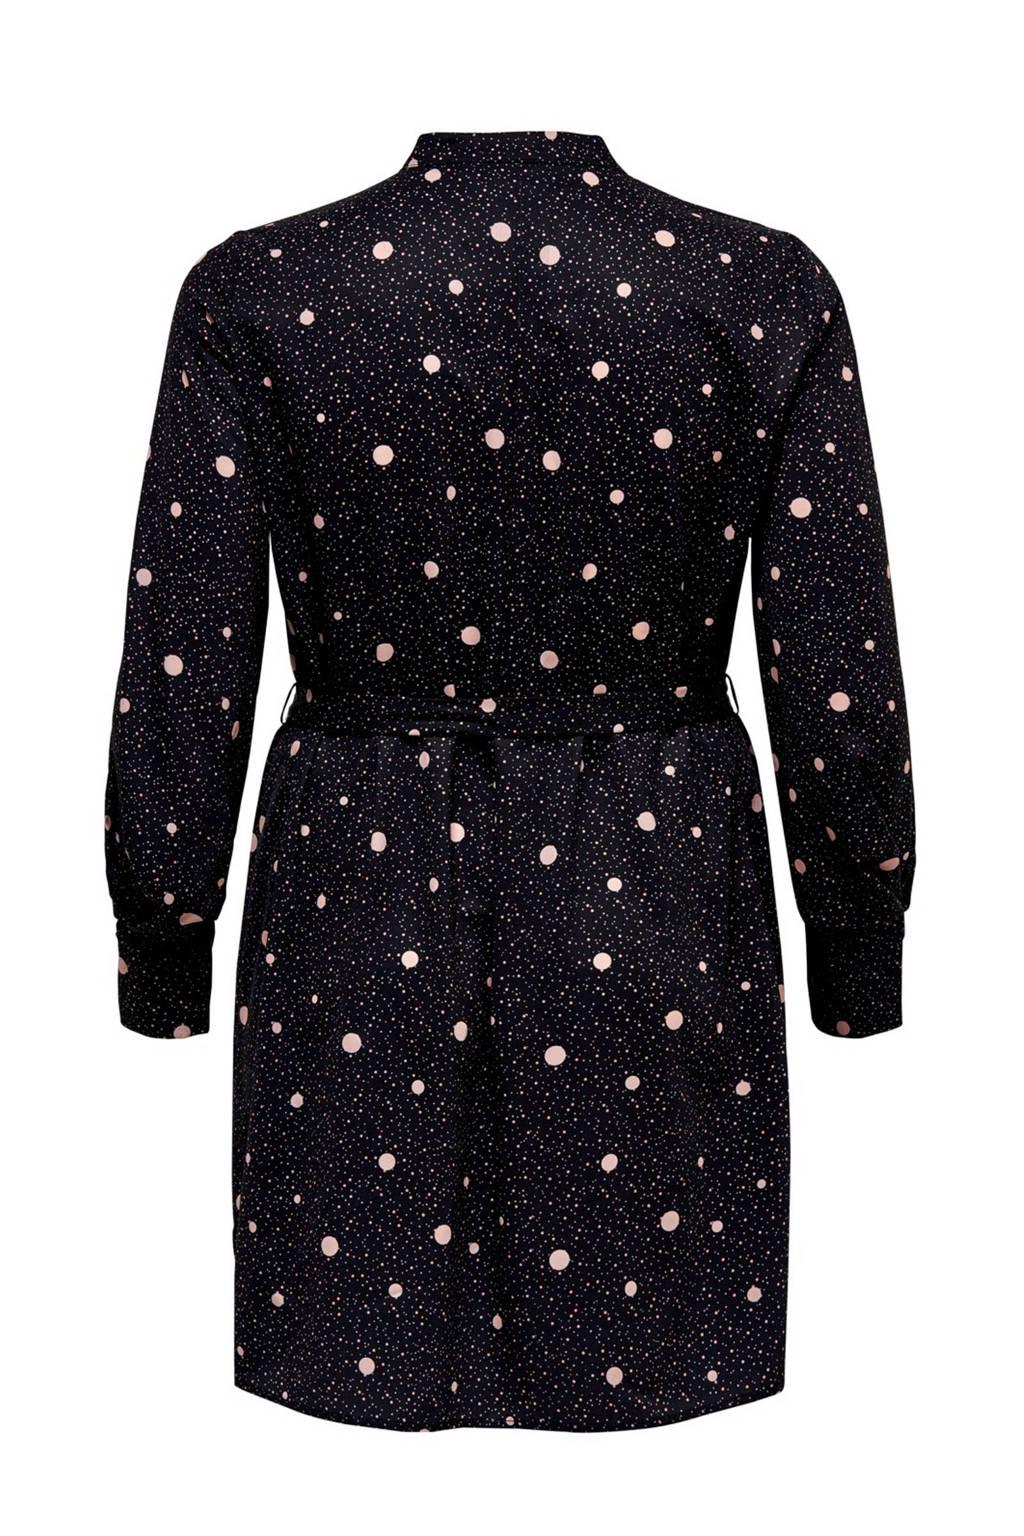 ONLY CARMAKOMA jurk met all over print en ceintuur zwart/wit, Zwart/wit